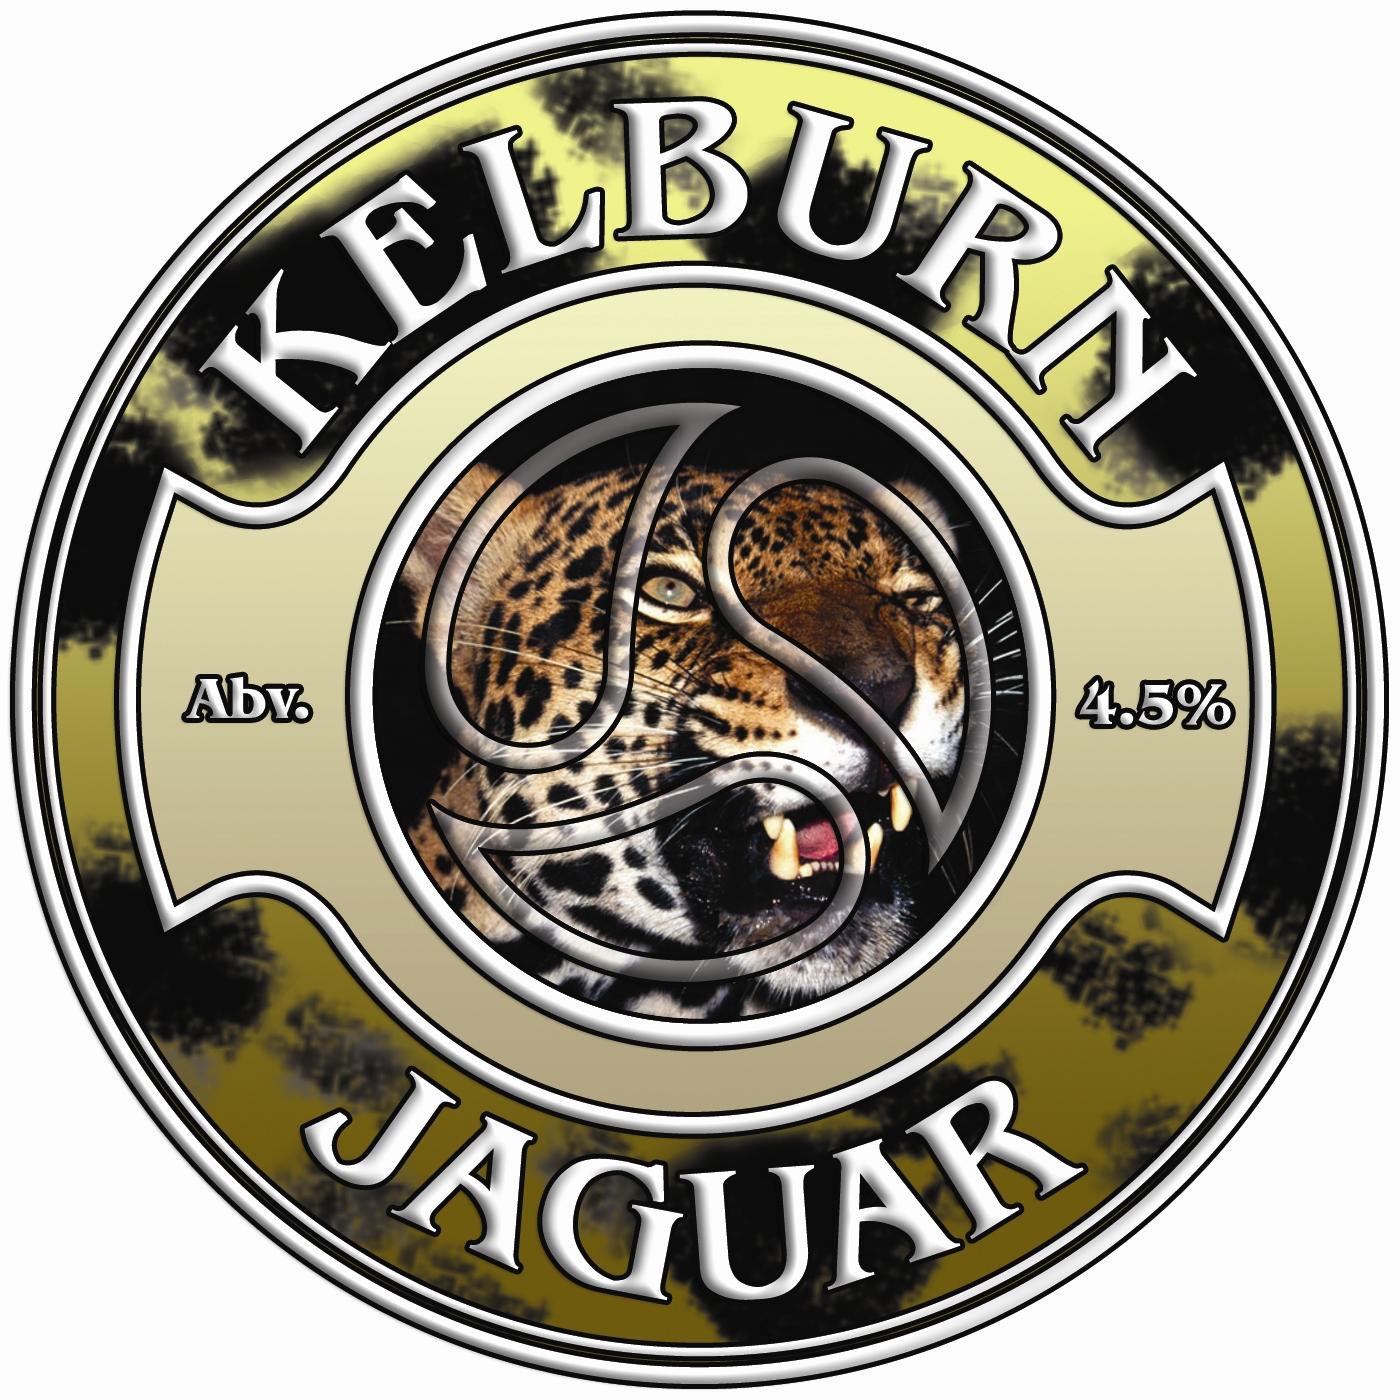 Kelburn Jaguar 9 Gallons Golden  4.5%